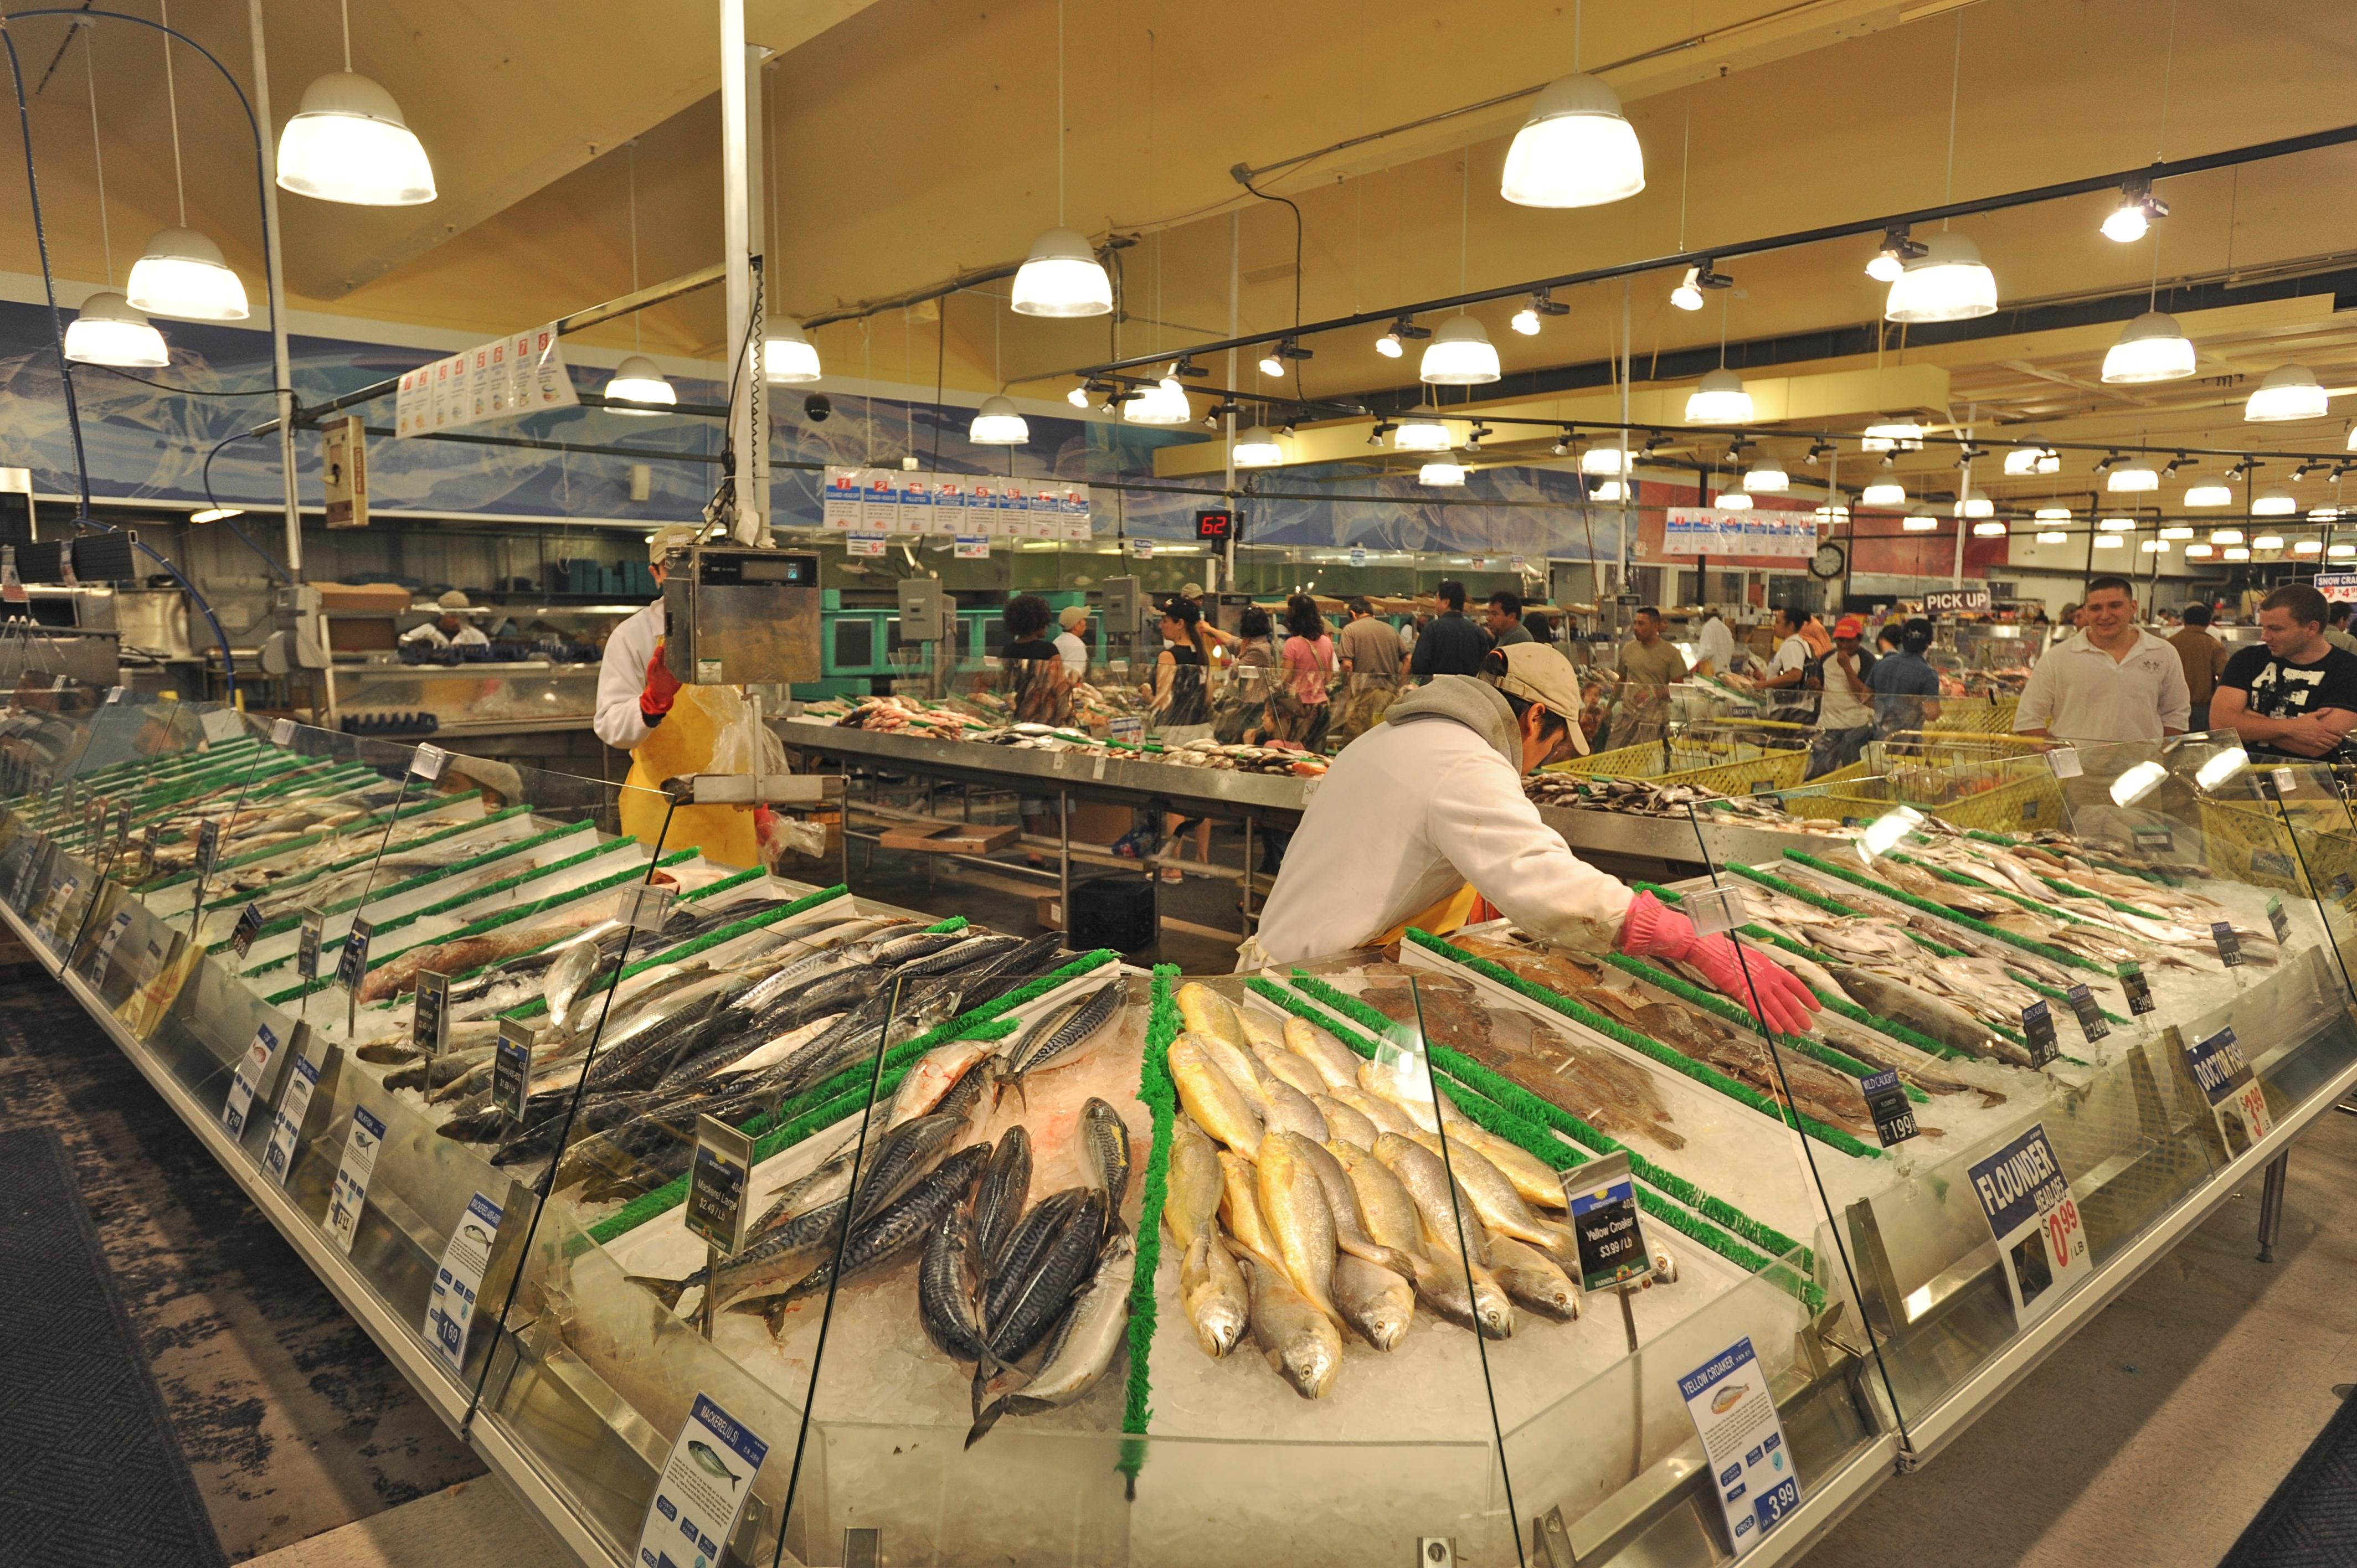 File:Buford Highway Farmer's Market in Doraville, Georgia.jpg - Wikimedia Commons